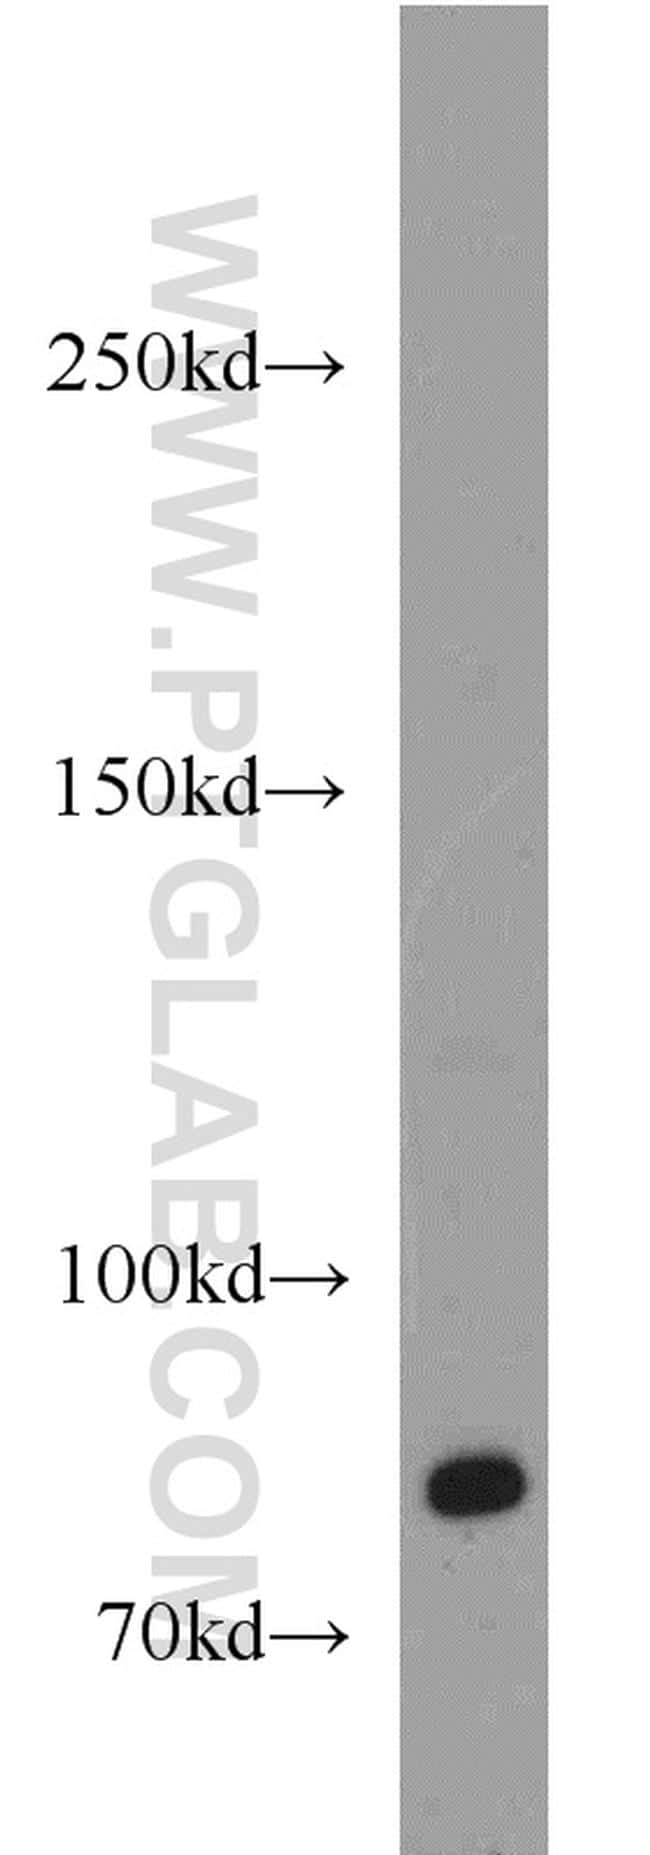 TEM1 Antibody in Western Blot (WB)